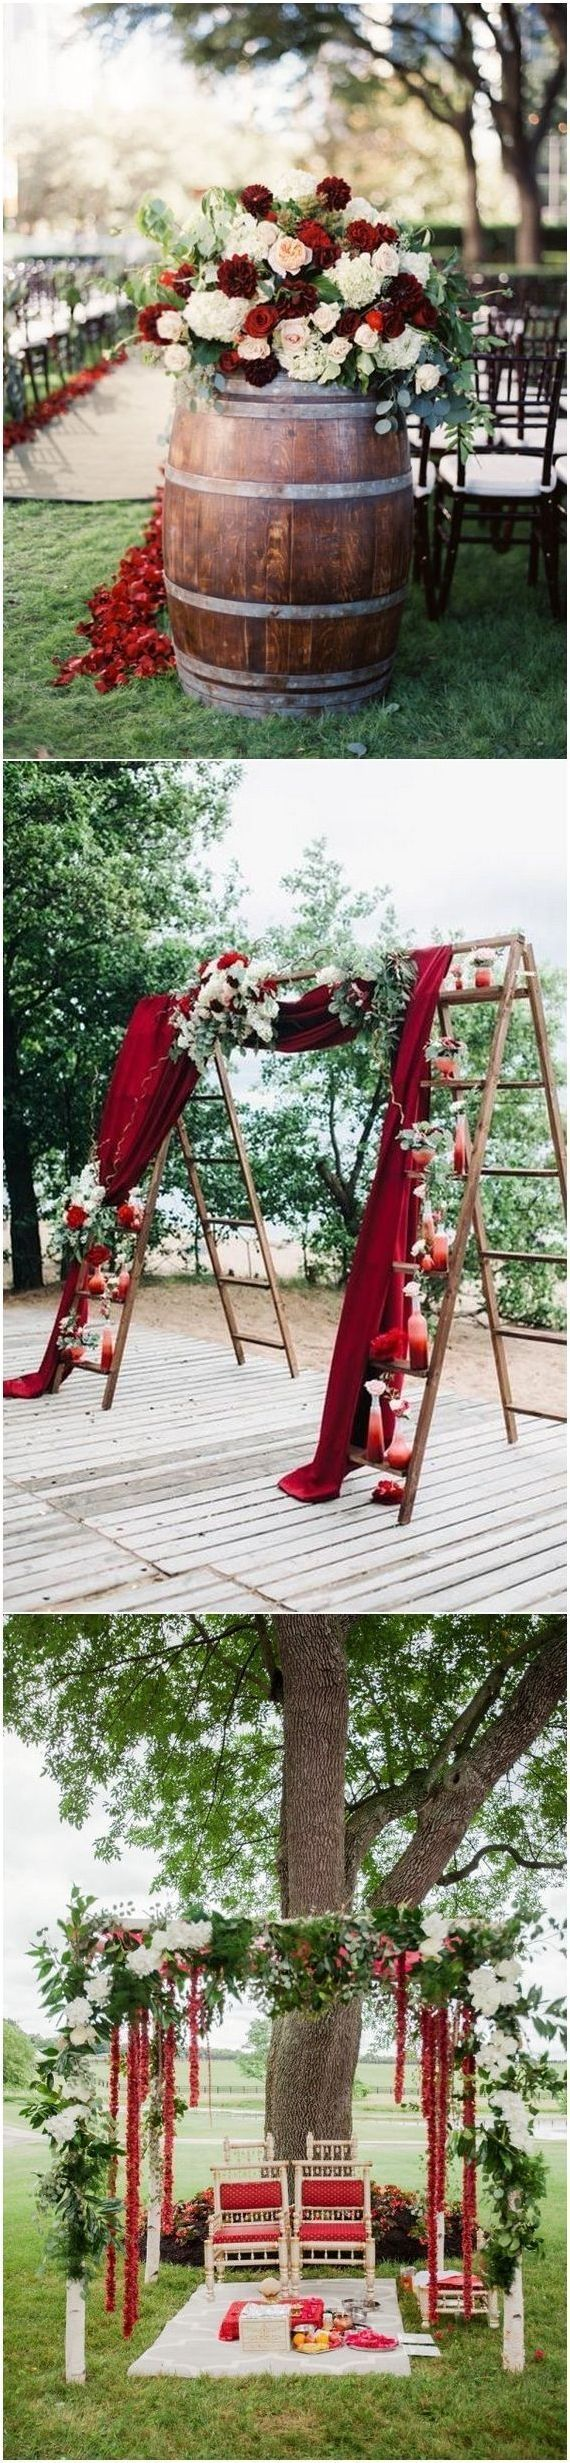 Gorgeous colors! #weddingdecoration